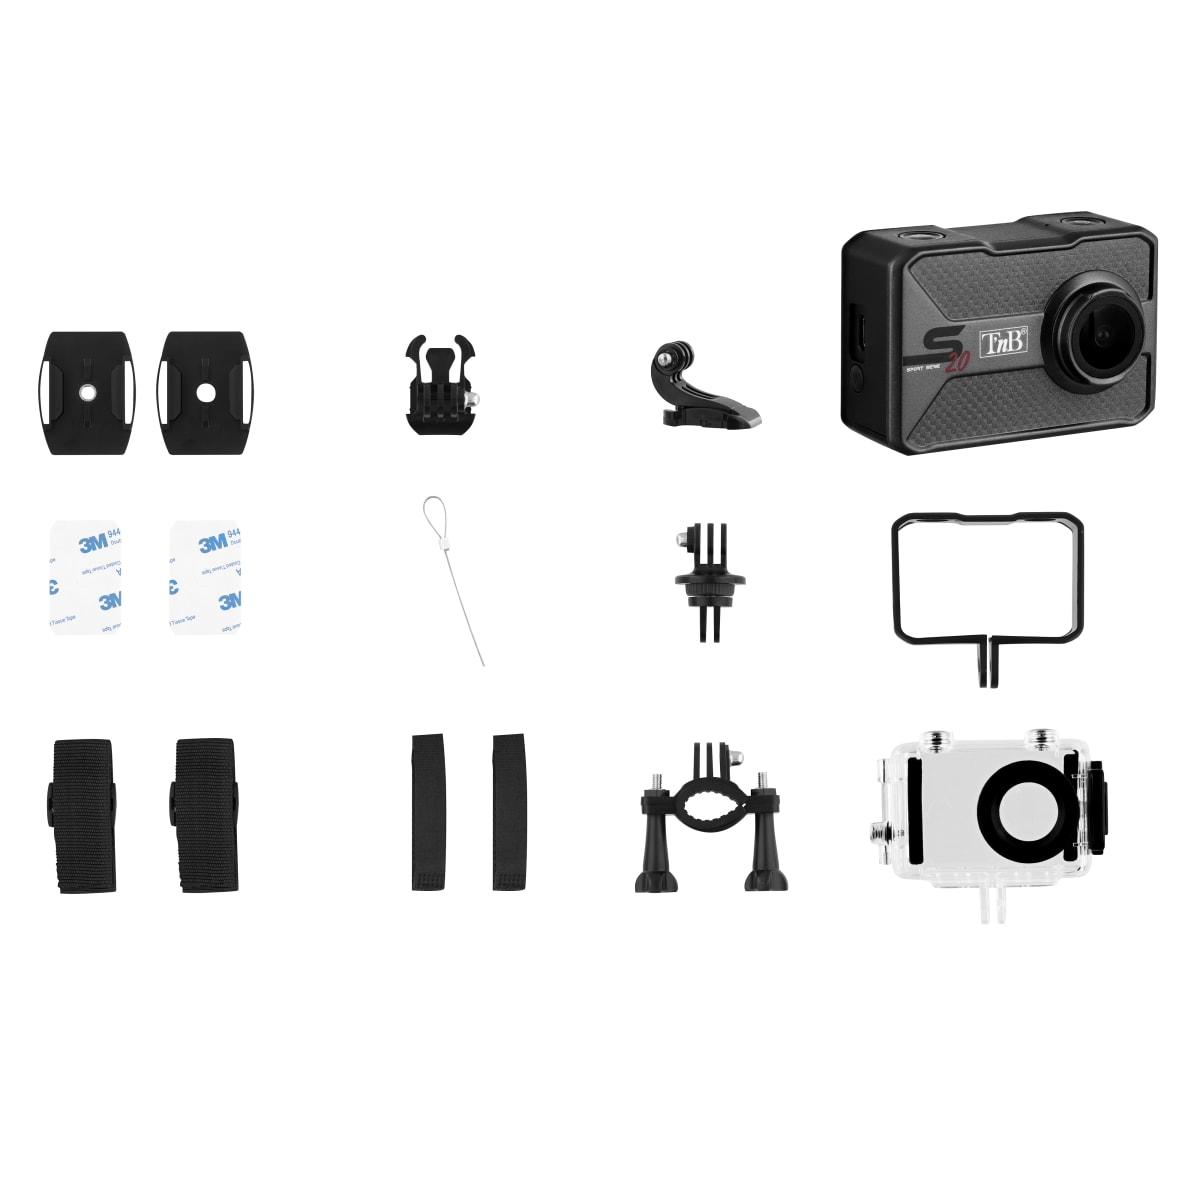 S20 sport camera